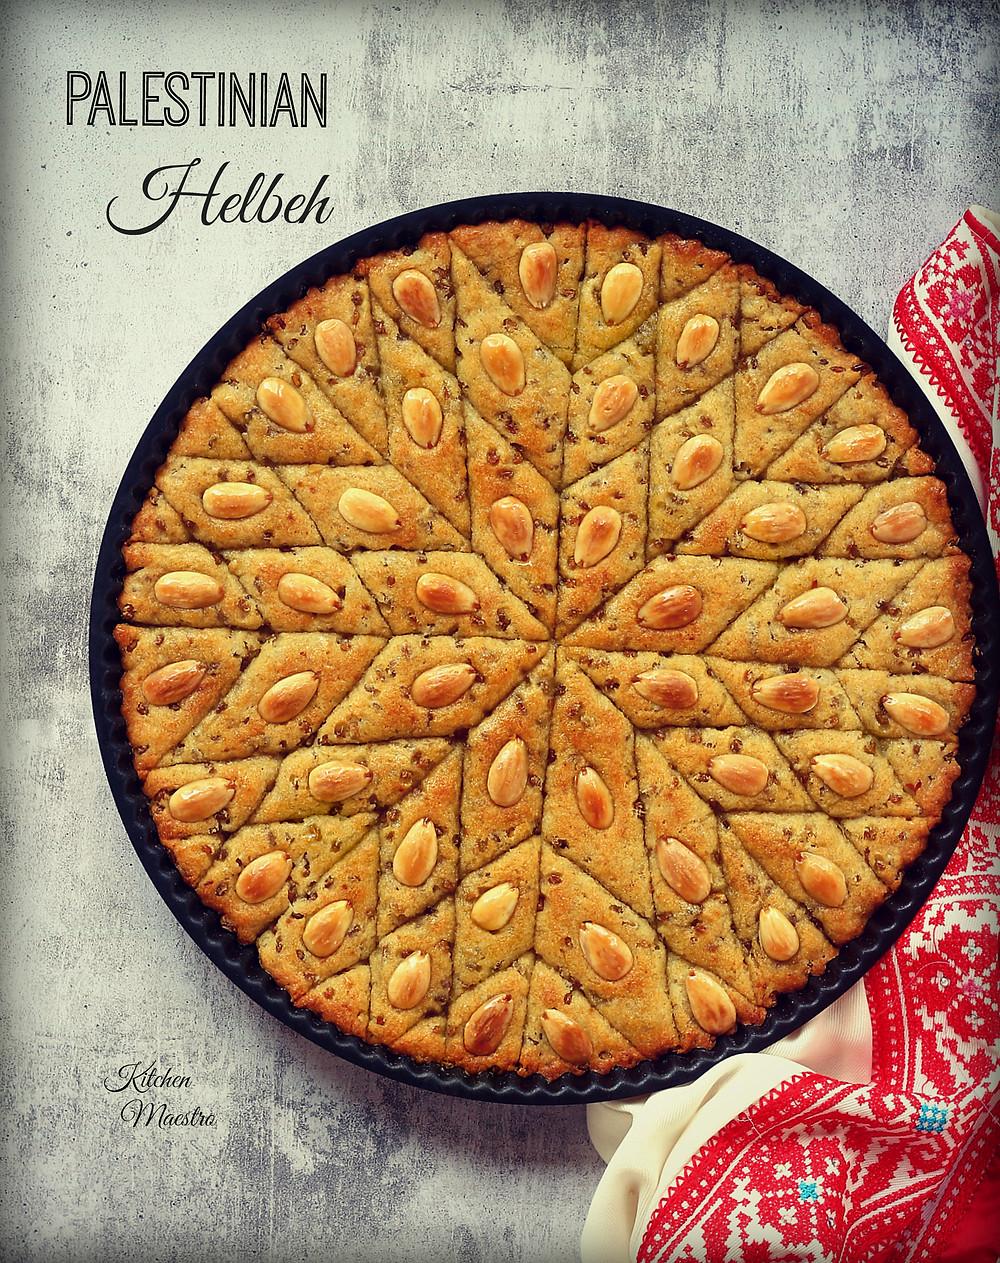 Palestinian Helbeh